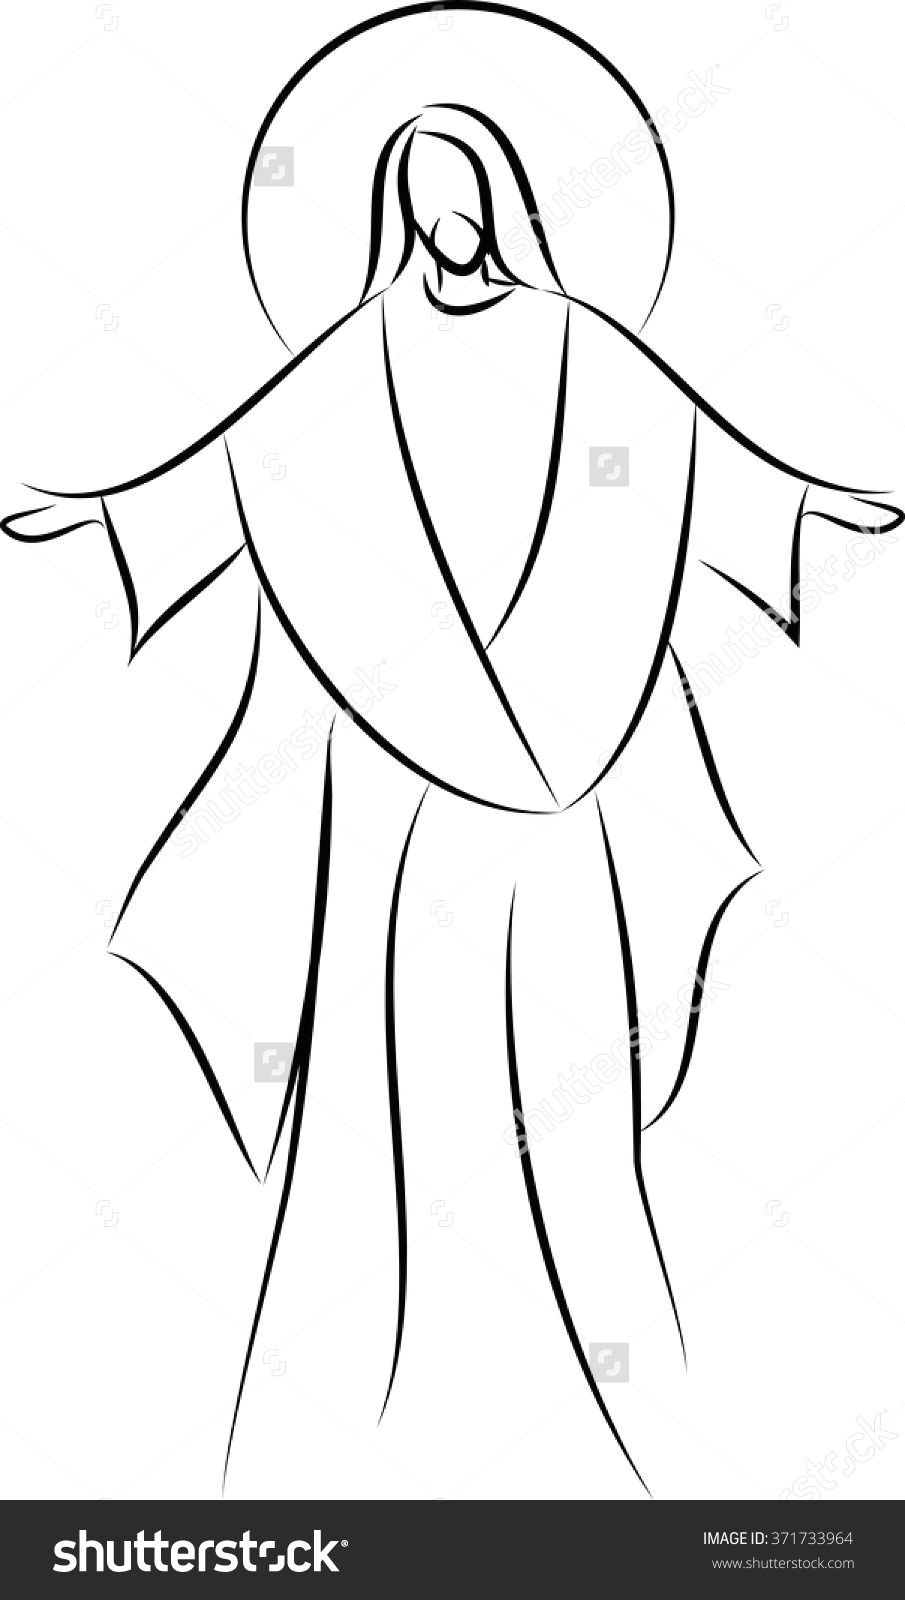 pin od zofia morua na wzory do techniki pergaminowej pinterest christ jesus christ i drawings